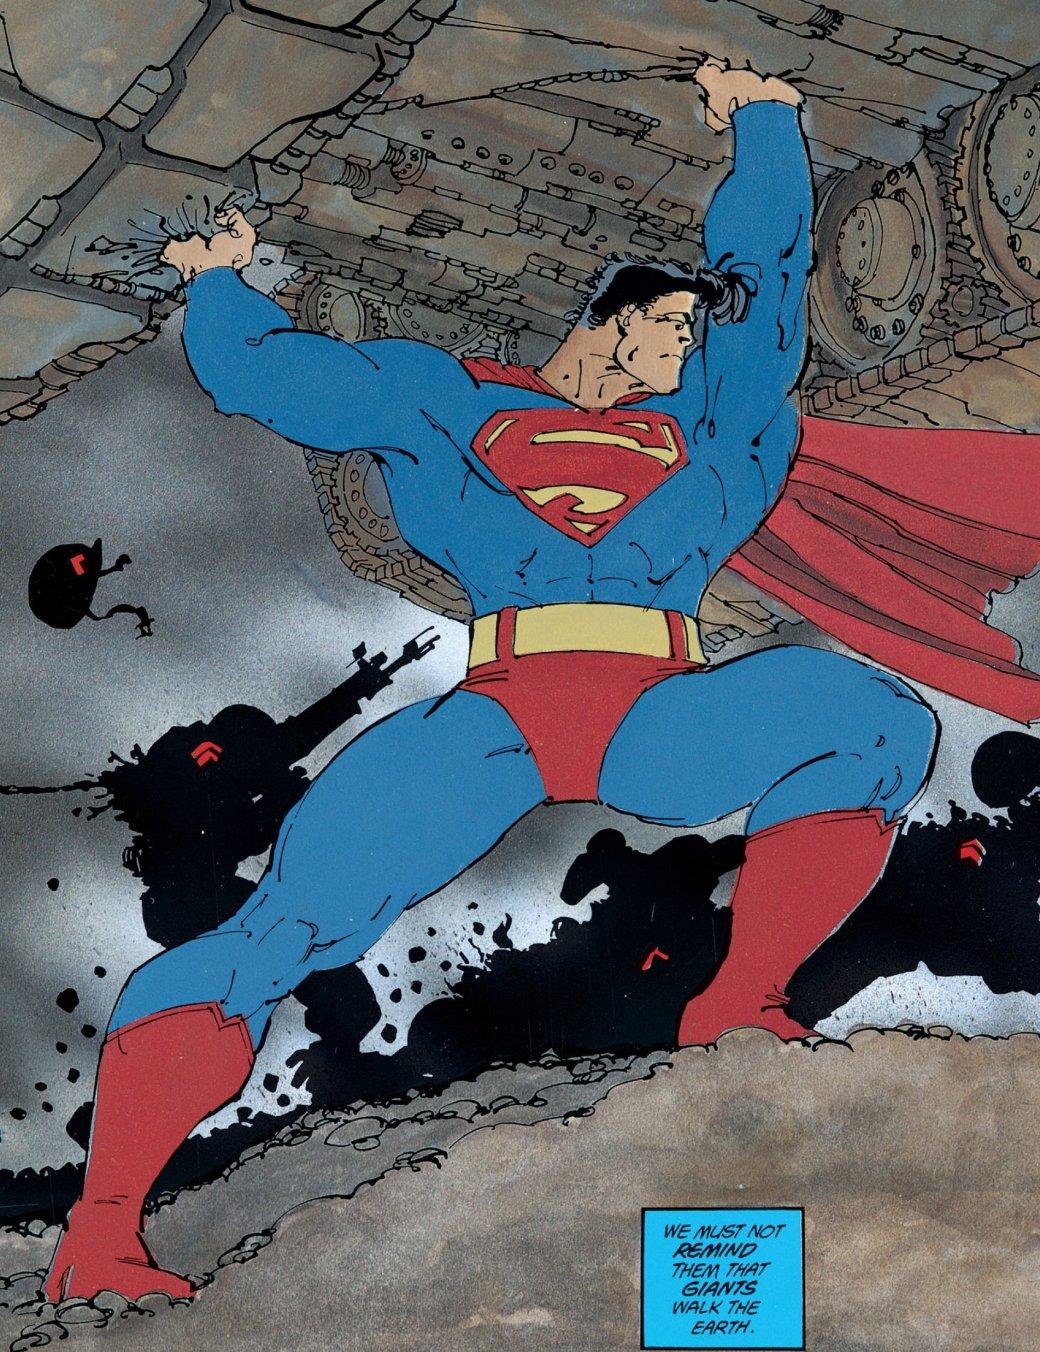 The Dark Knight: что нетак скомиксами Фрэнка Миллера про Бэтмена? | Канобу - Изображение 11